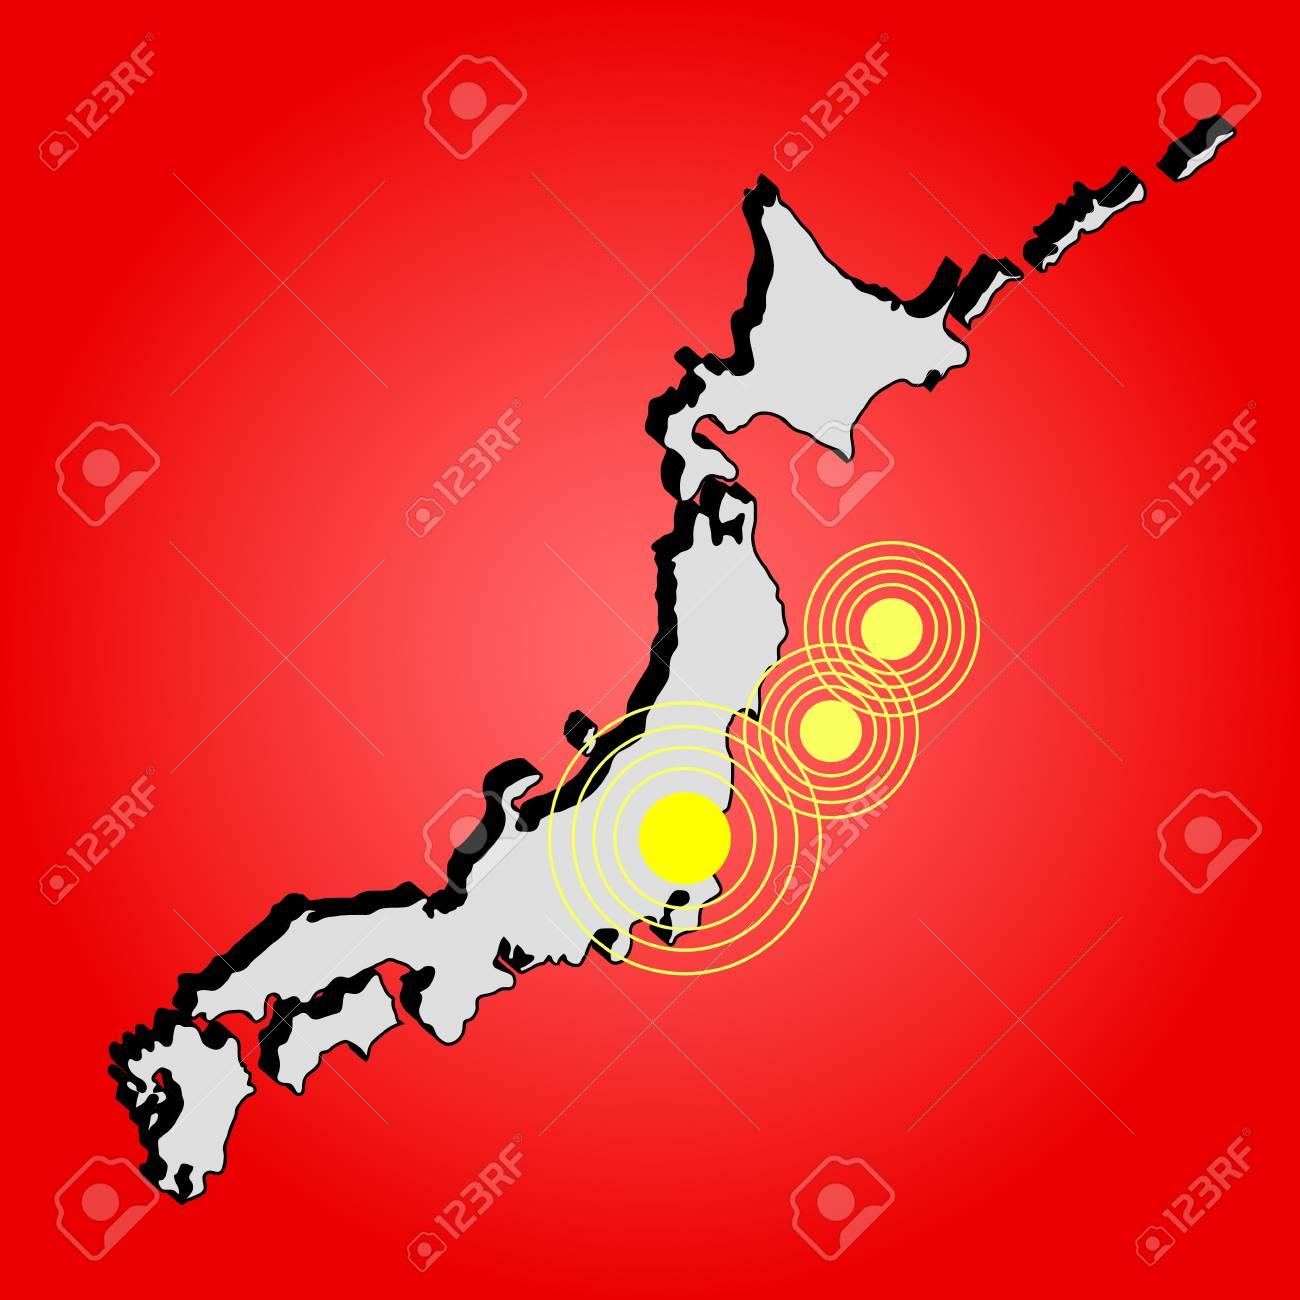 Earthquake in Japan, illustration Stock Illustration - 9484712